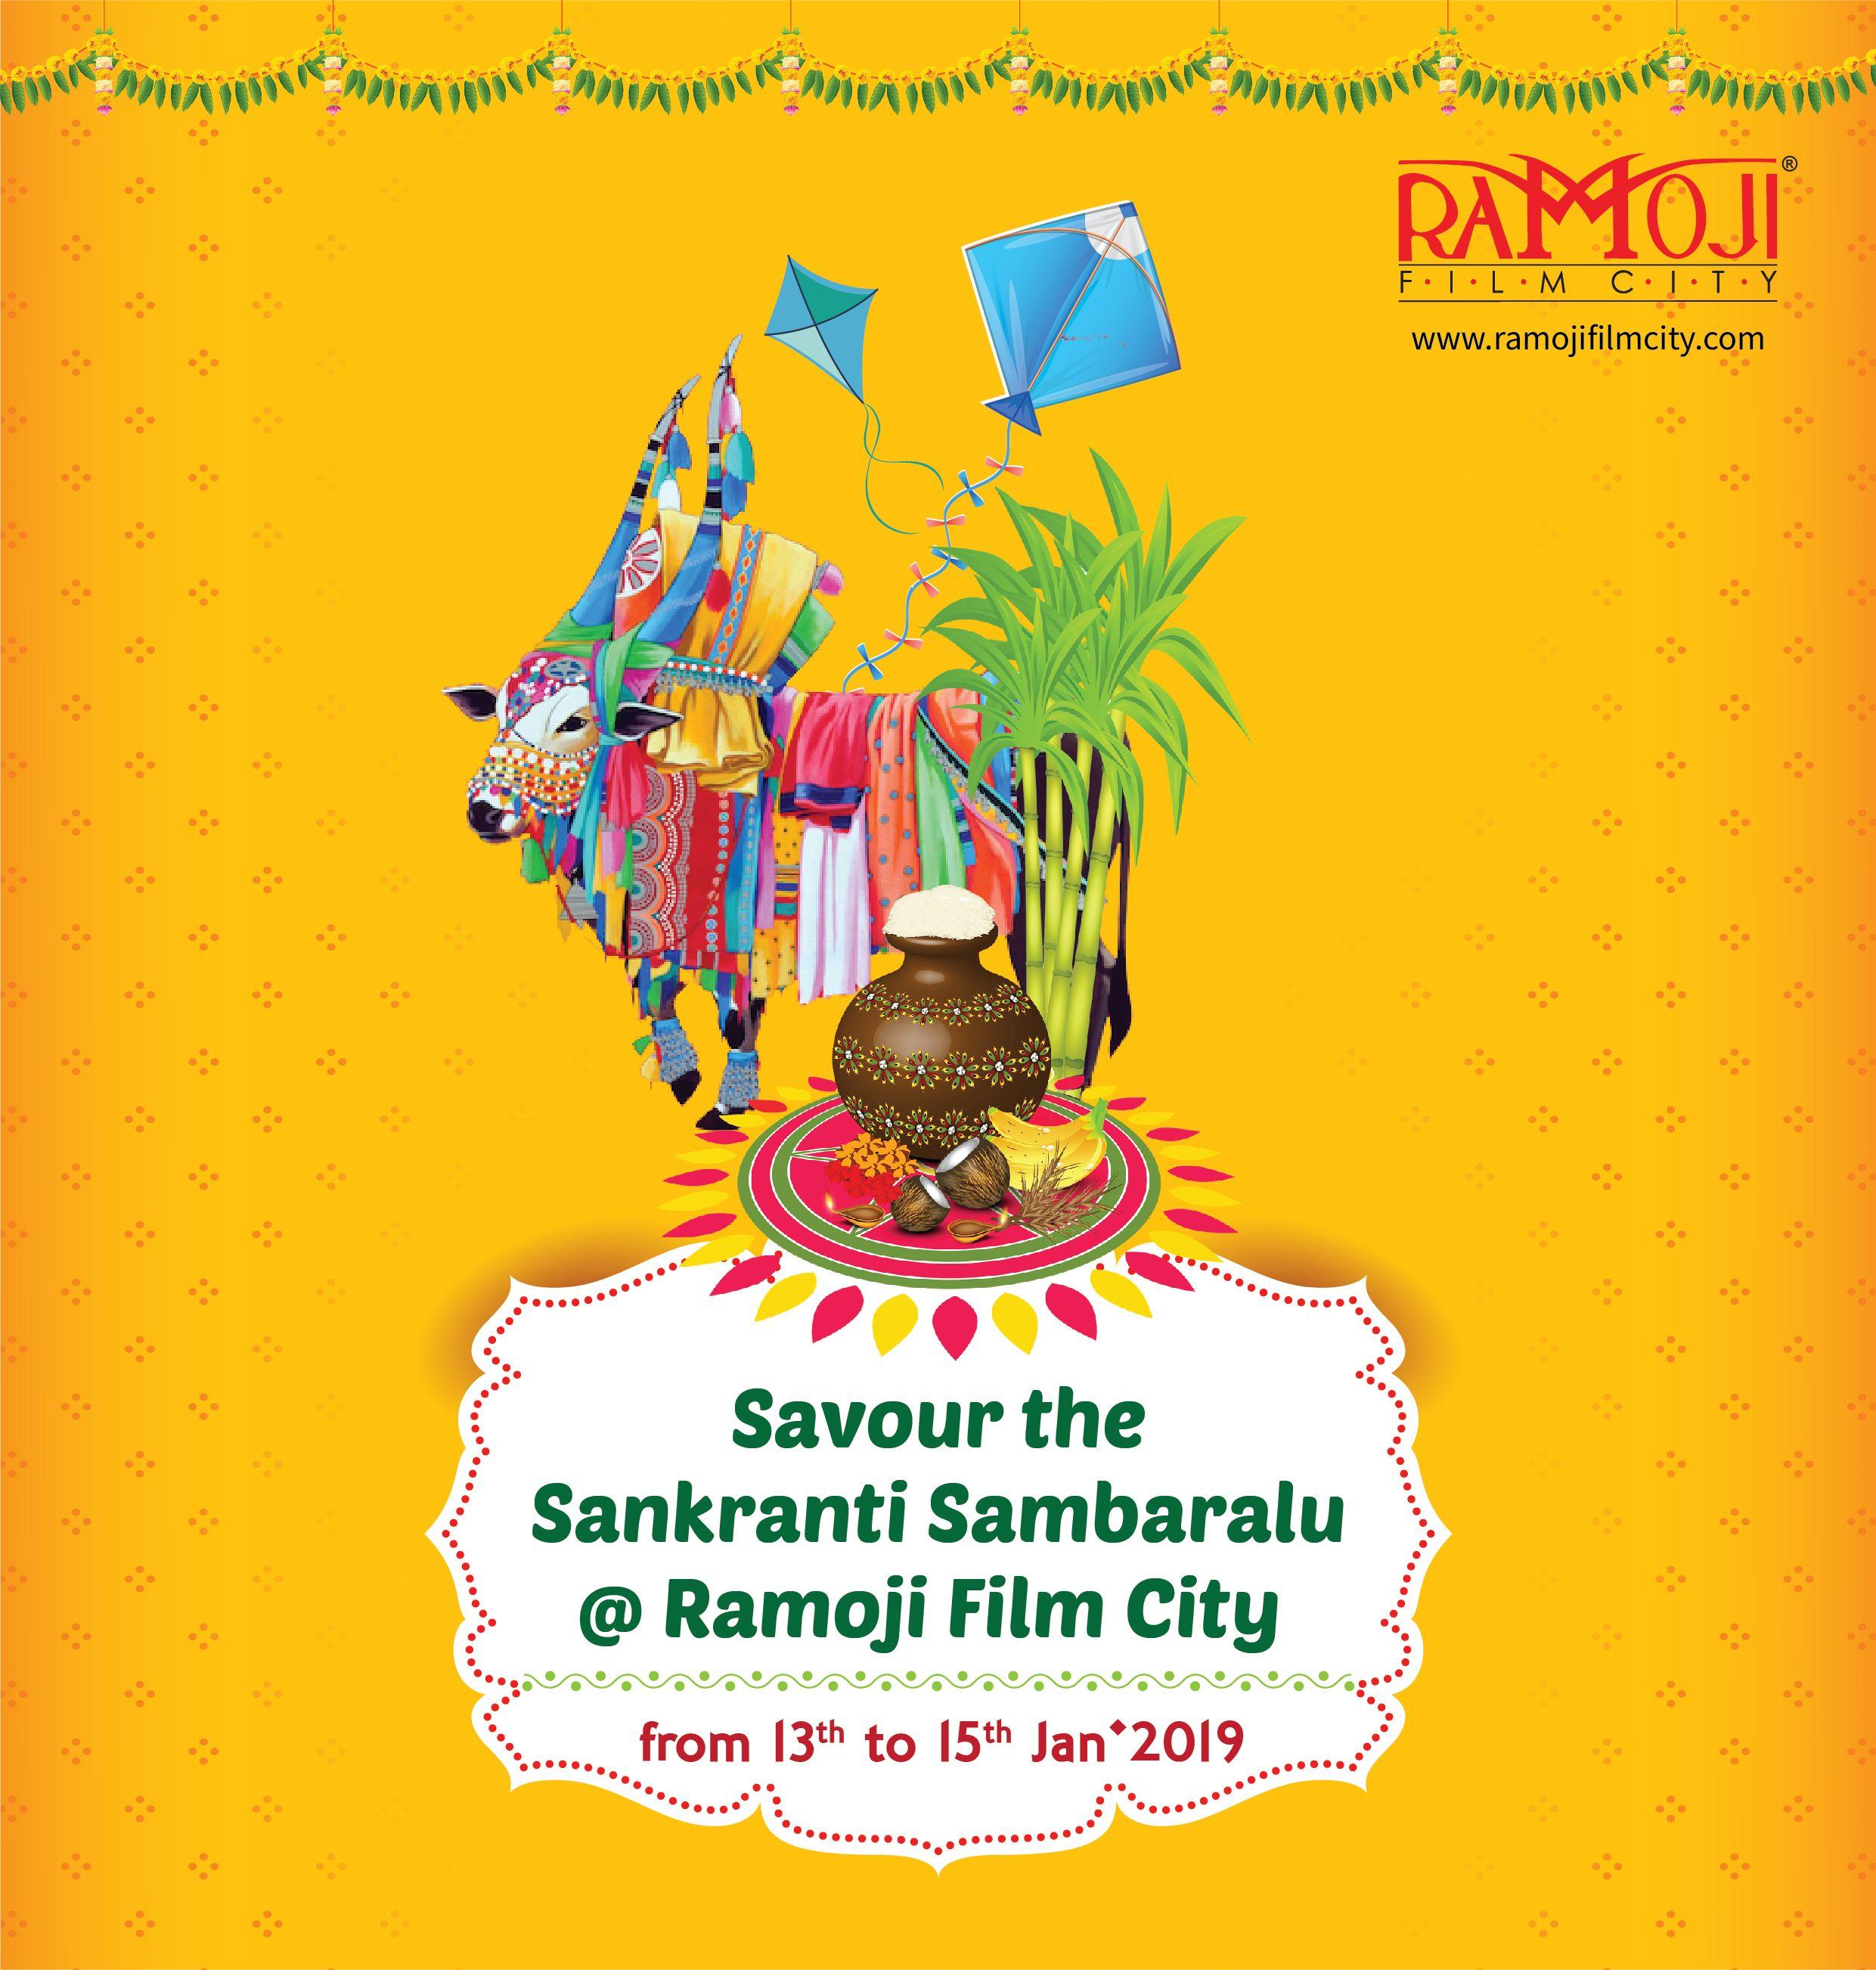 Come Enjoy Sankranti Sambaralu At Ramoji Film City From